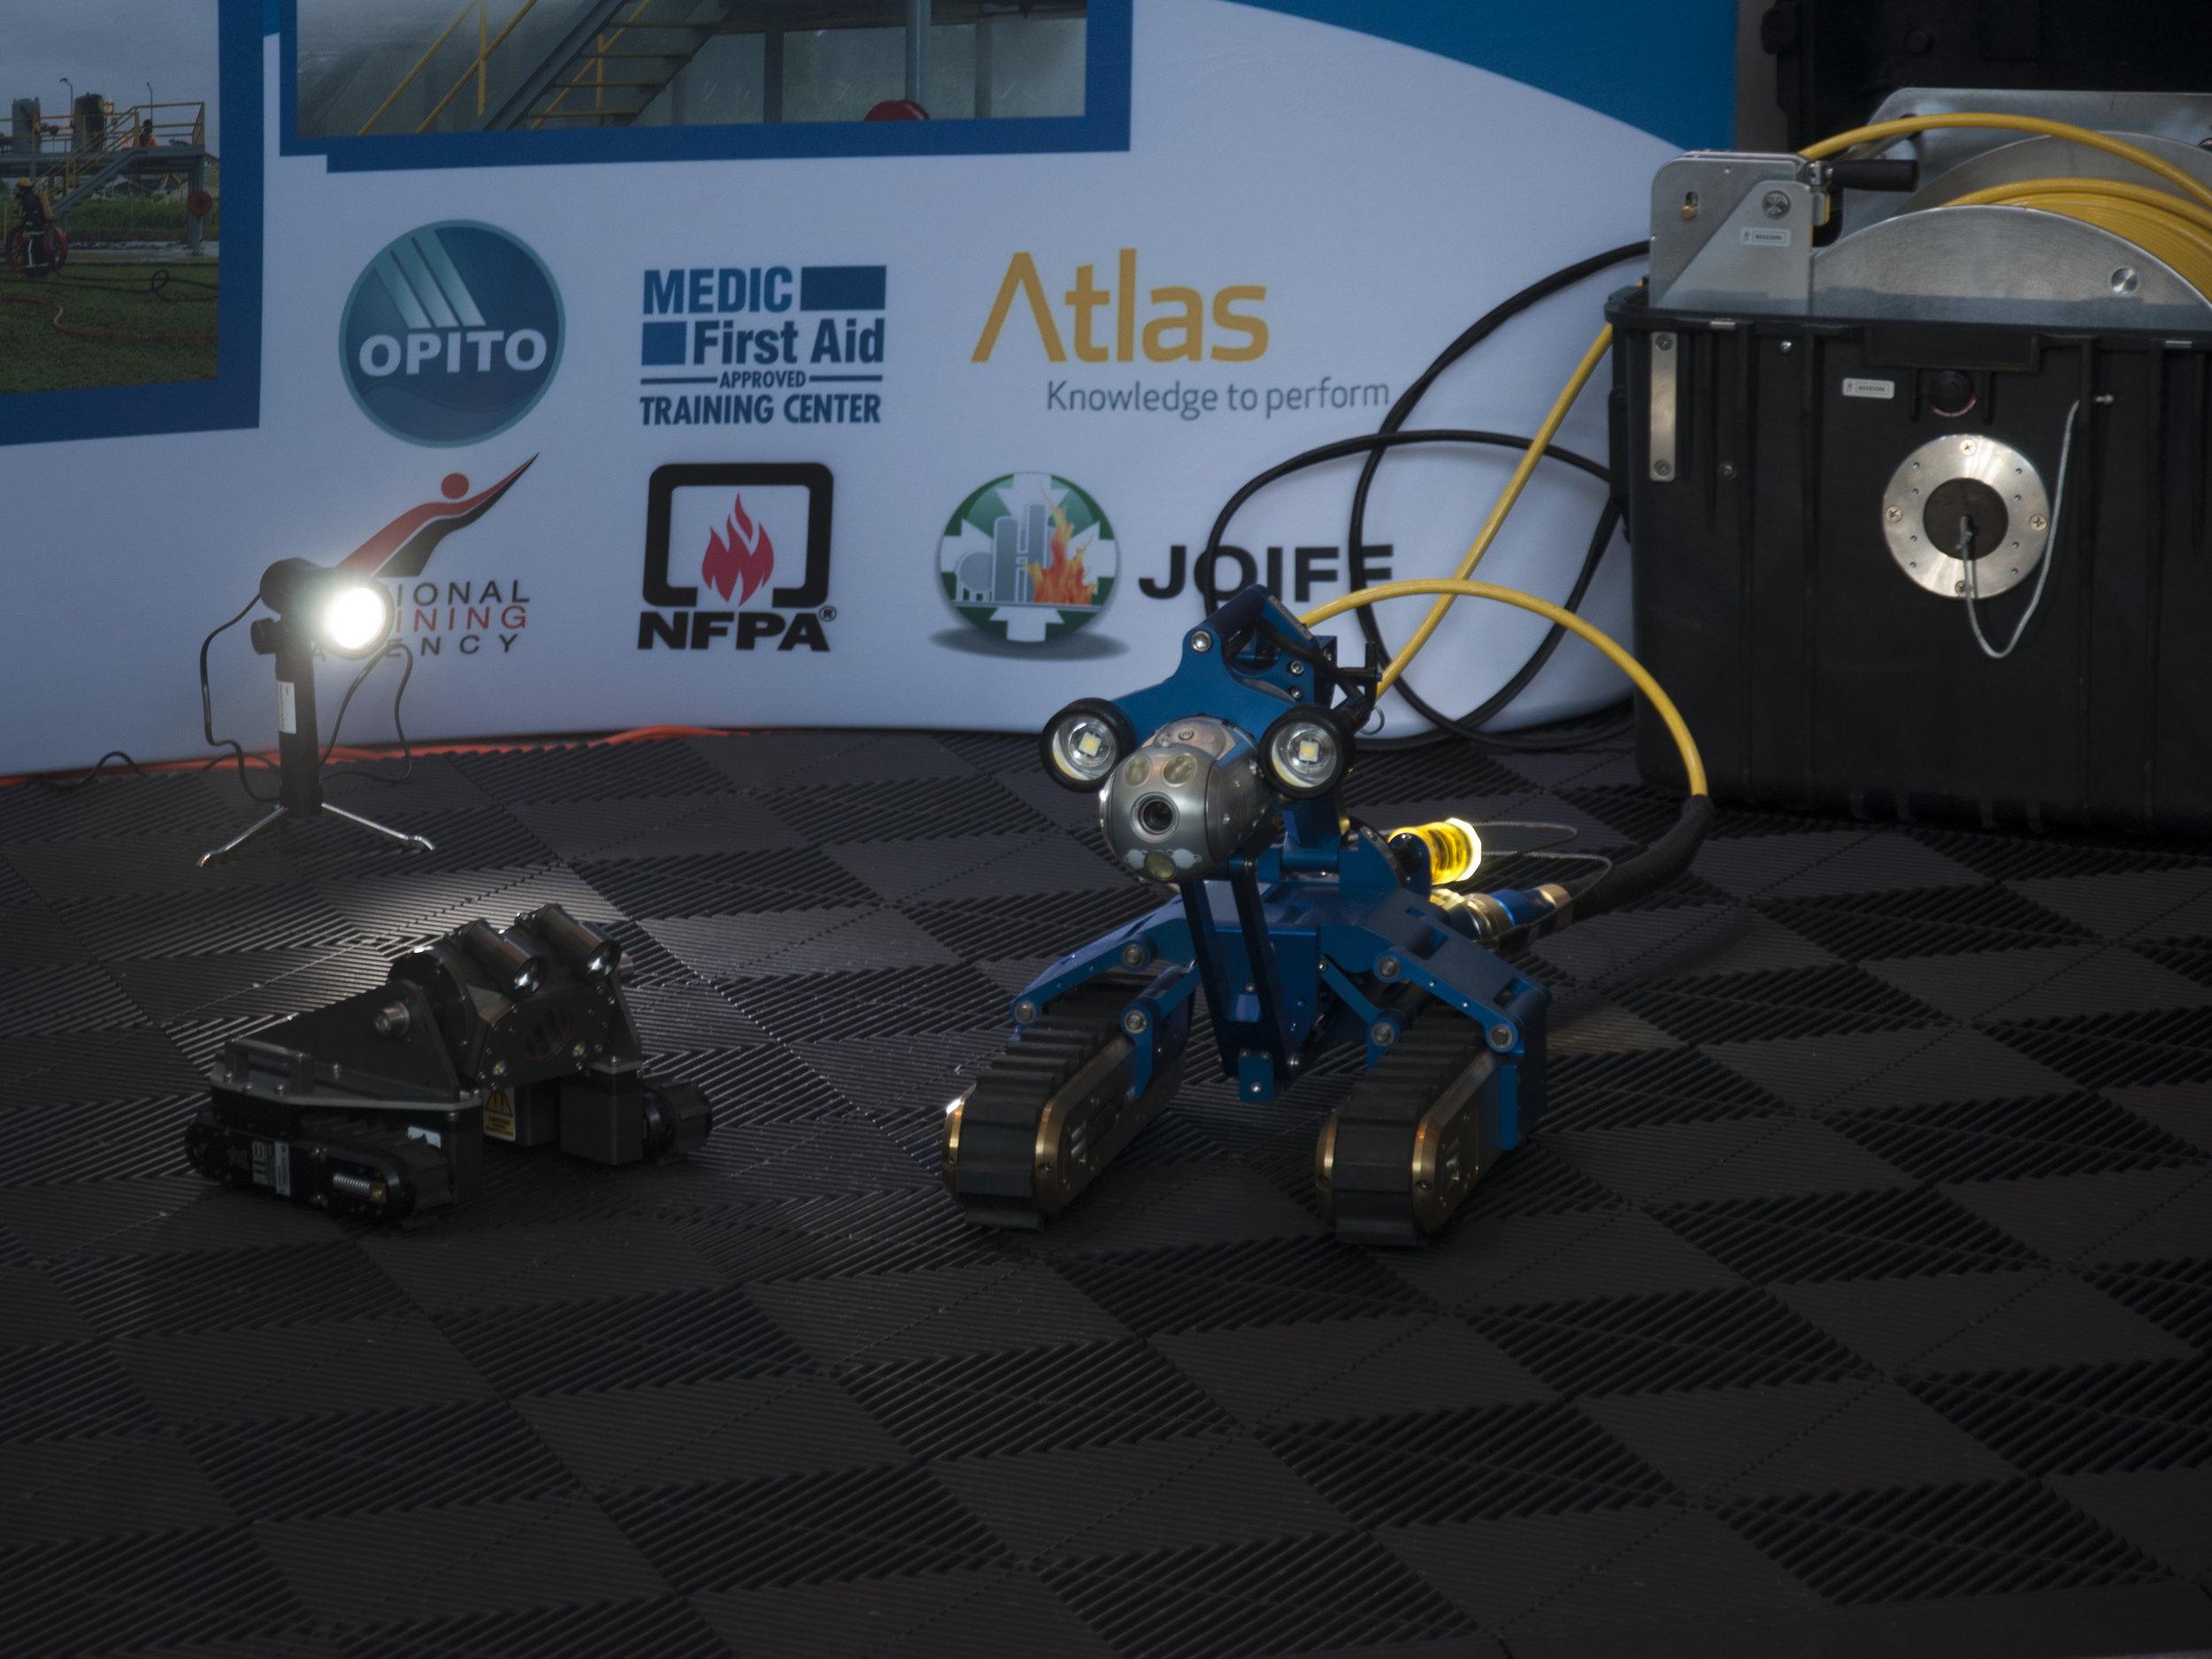 Inuktun's MaggHD™ and Versatrax 150™ inspection robotic crawlers